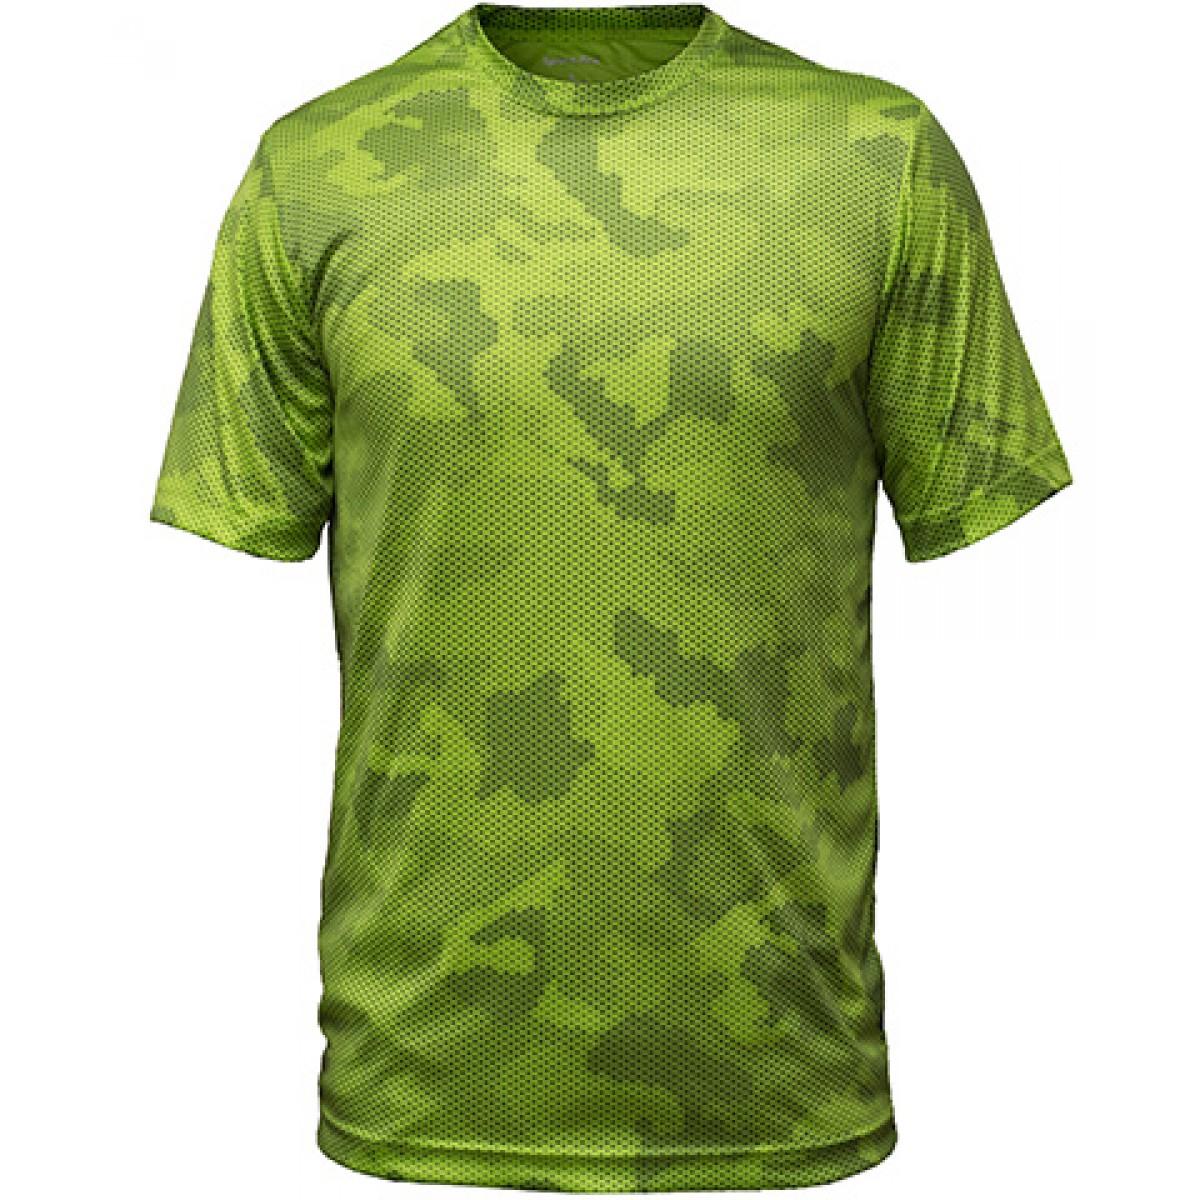 Sport-Tek CamoHex Tee-Green-3XL